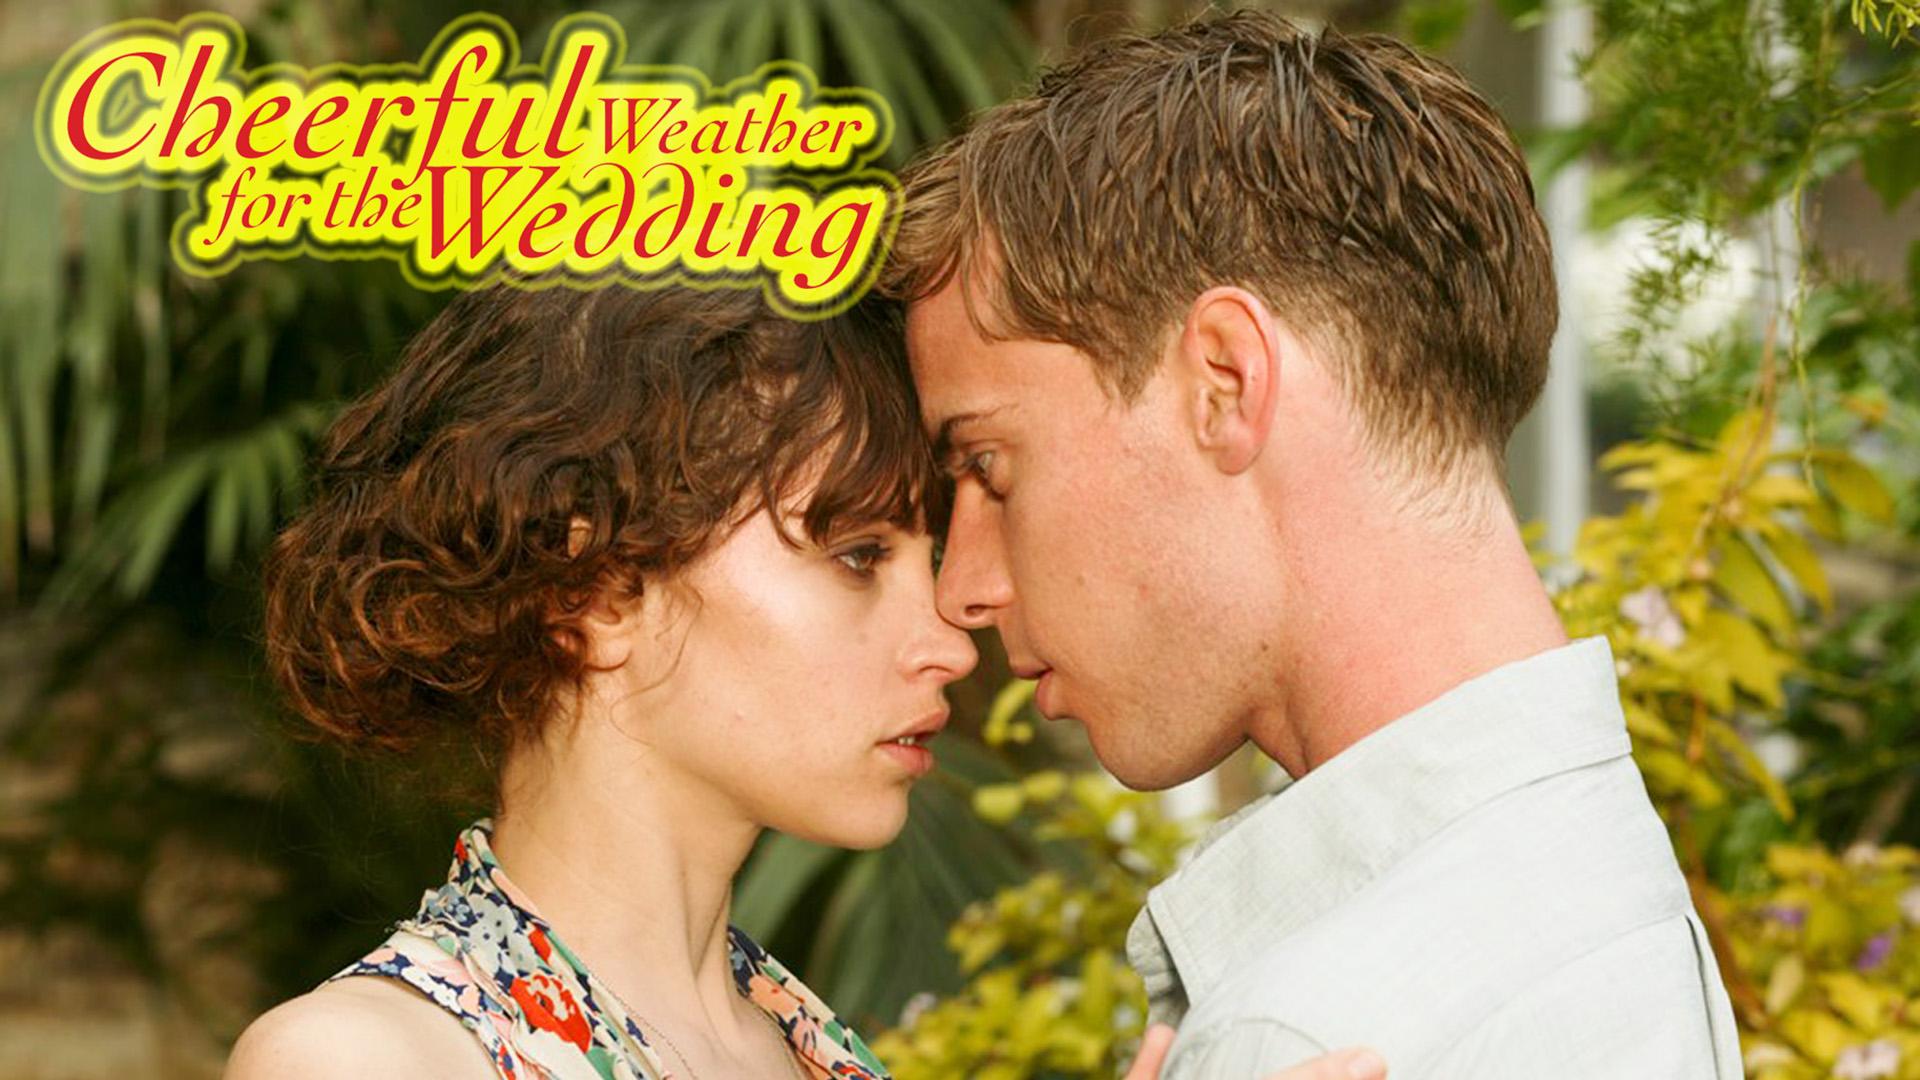 Cheerful Weather for the Wedding on Amazon Prime Video UK